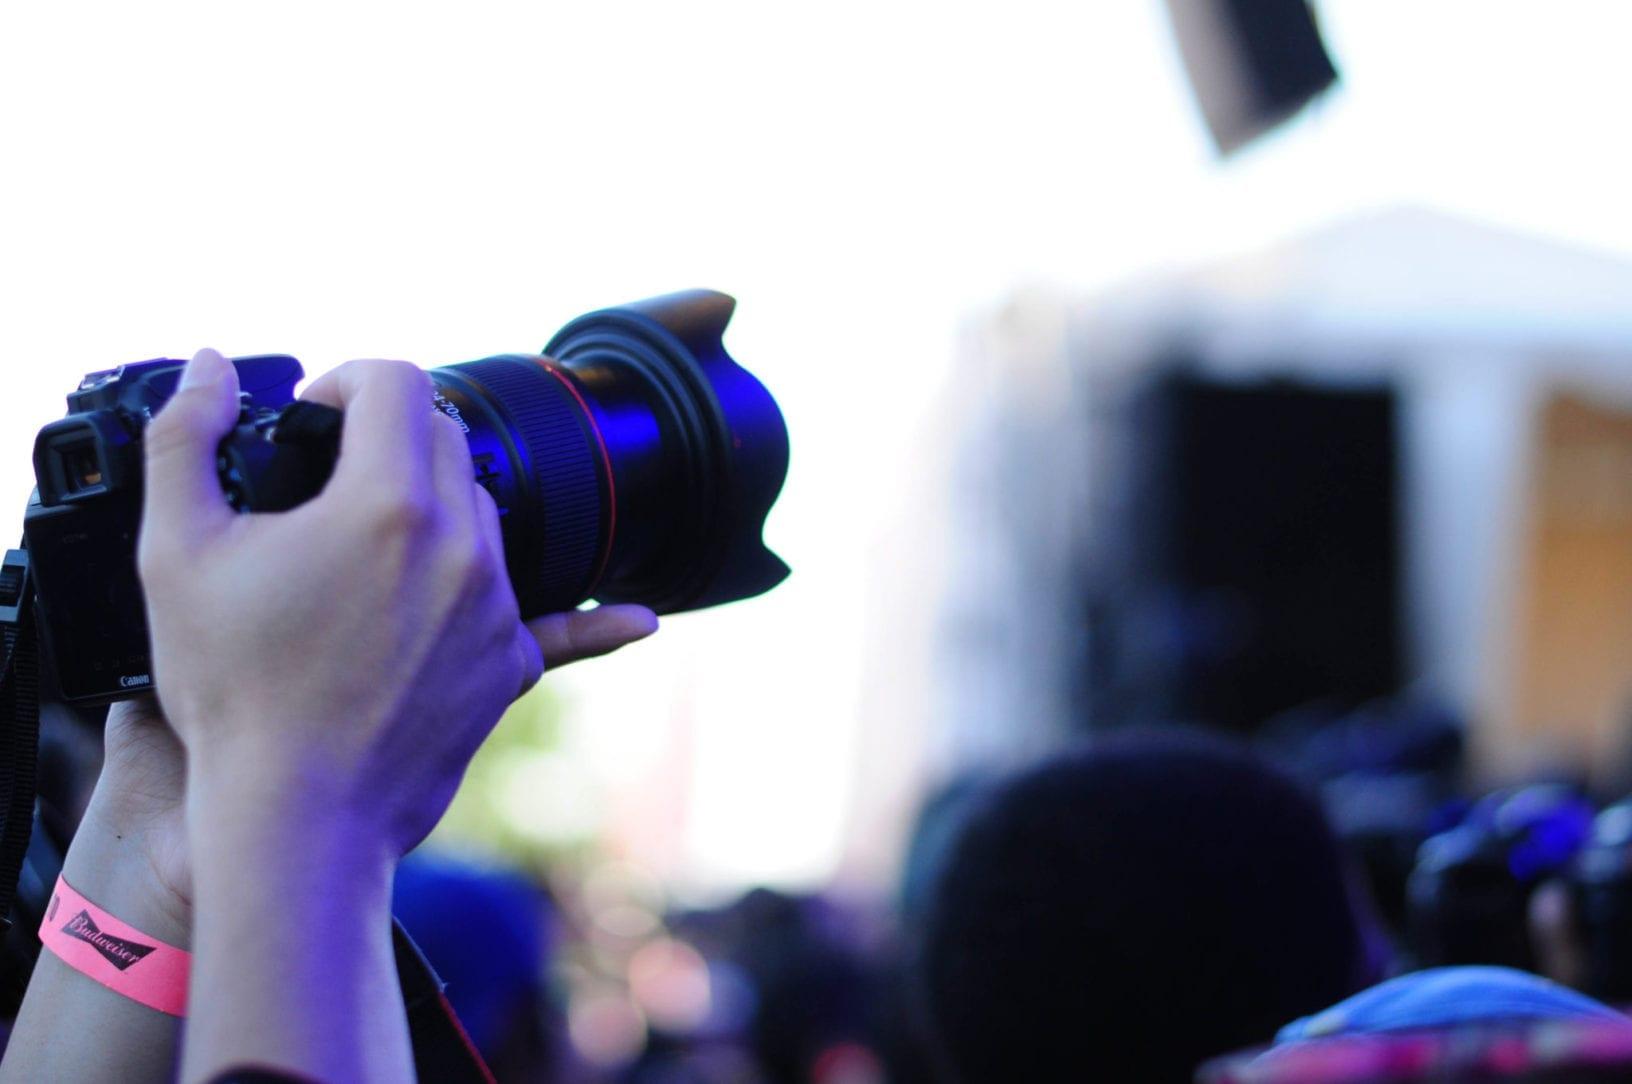 Ghostface Killah NXNE 2016 Media takes pictures